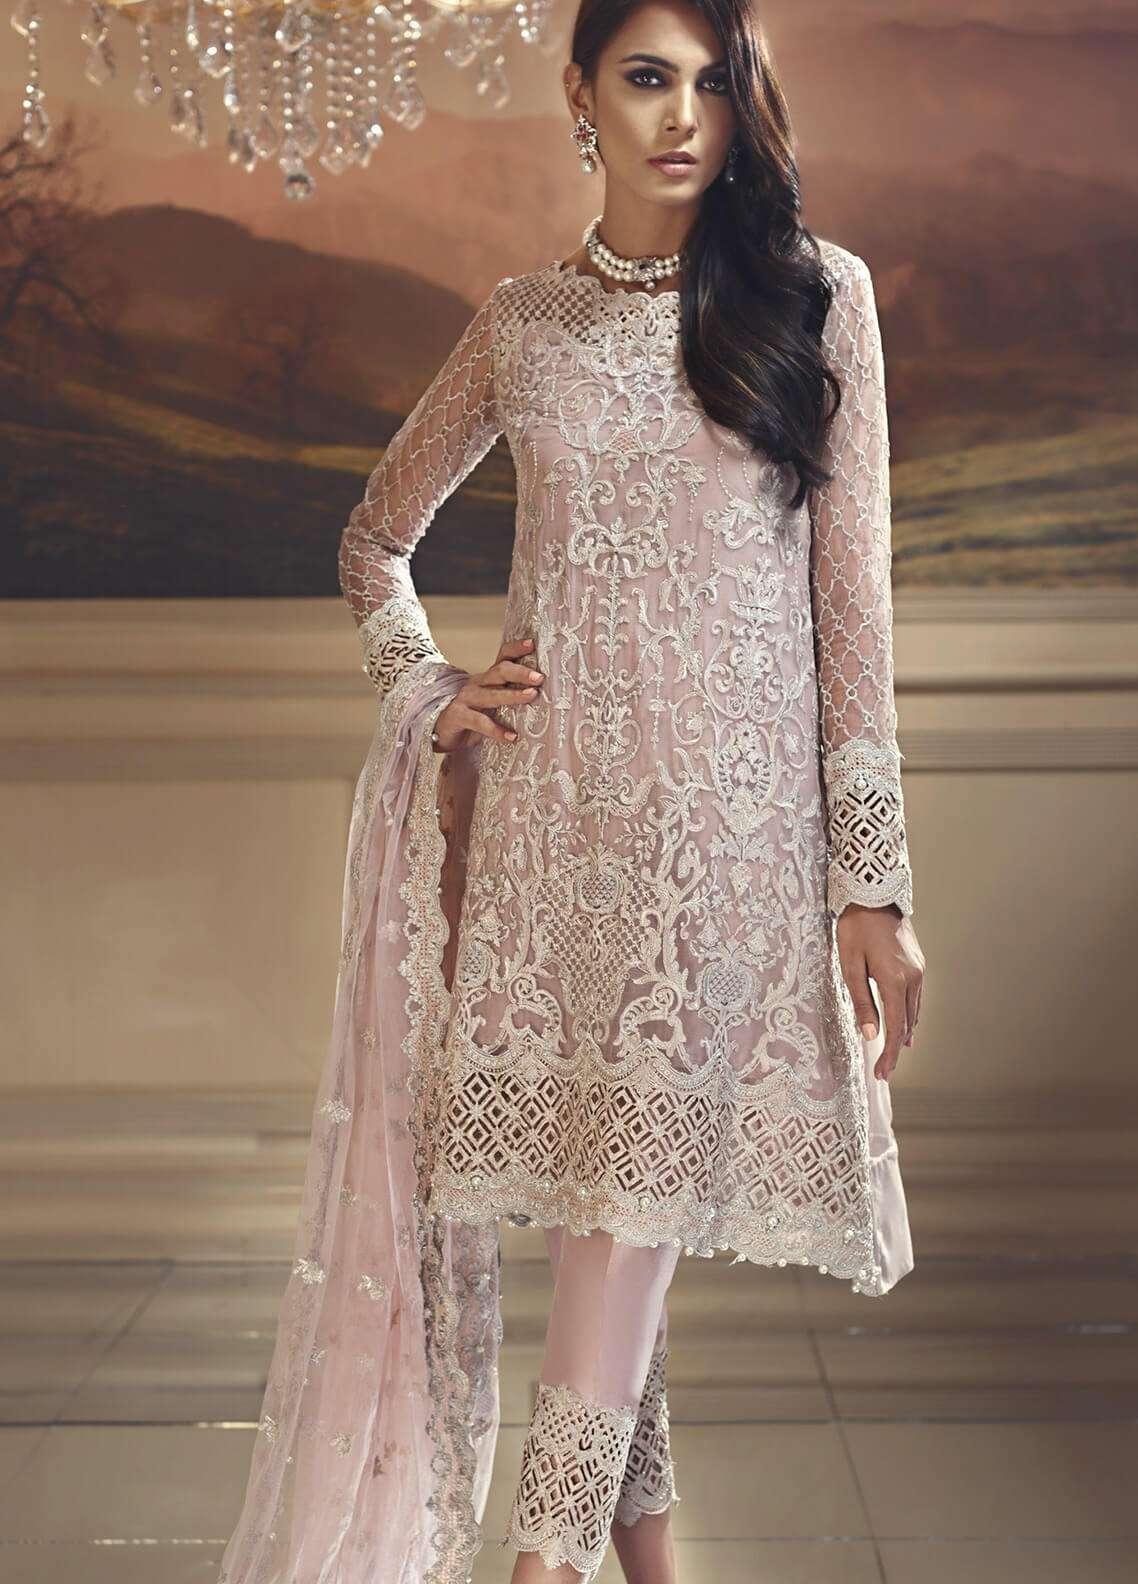 Anaya by Kiran Chaudhry Embroidered Chiffon Unstitched 3 Piece Suit AKC18W 06 - Wedding Edition